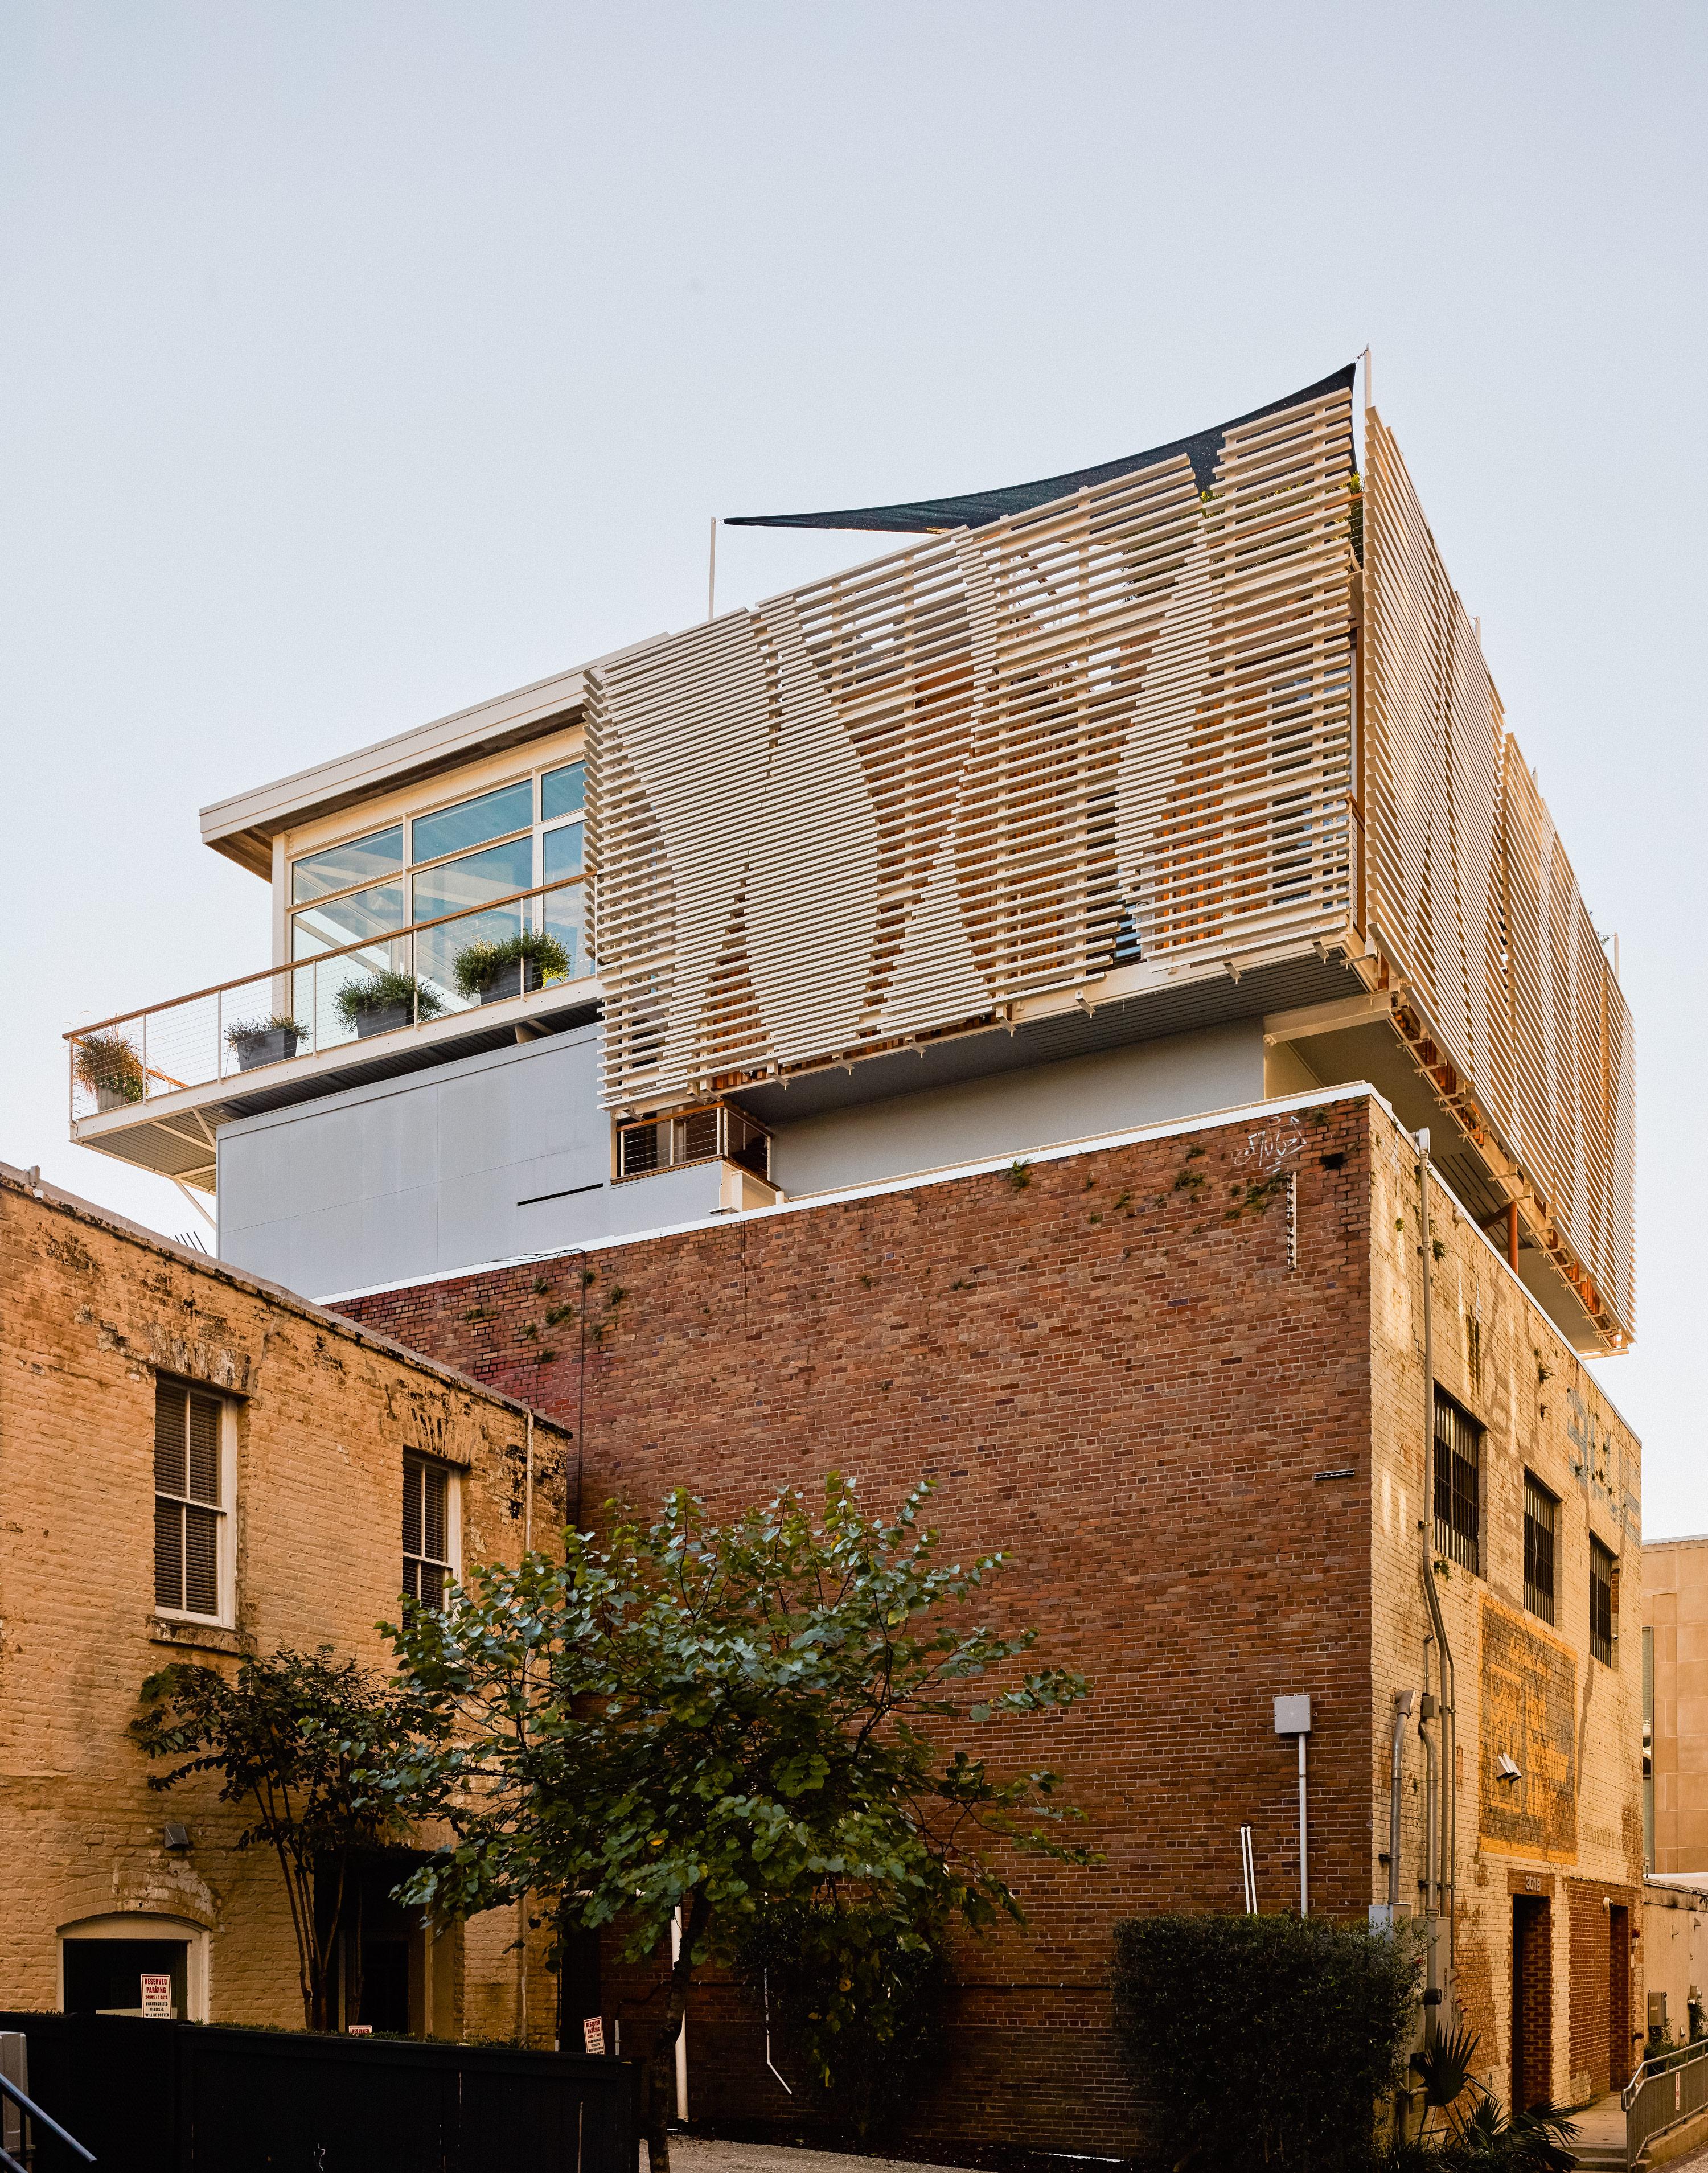 Fiberglass facade of warehouse in Charleston, South Carolina.